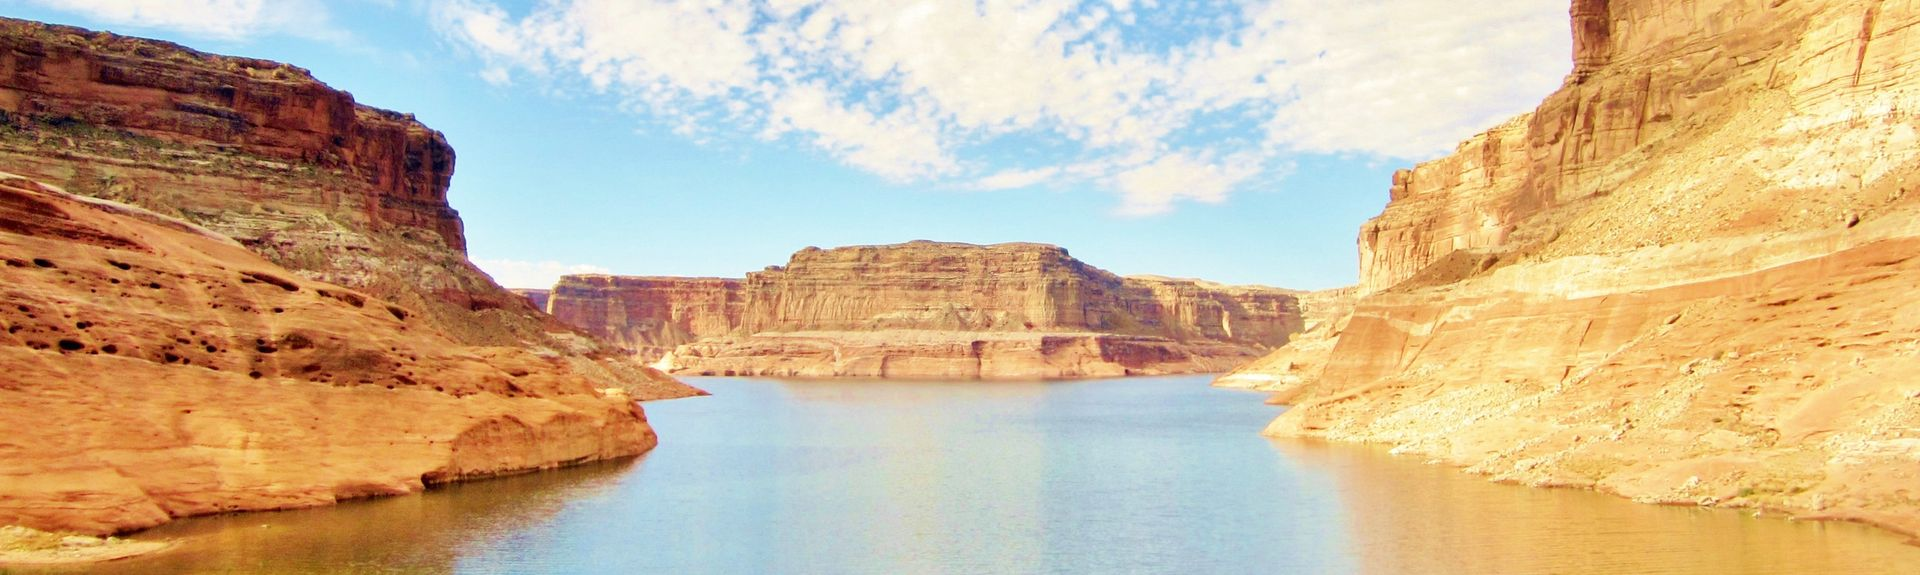 Glen Canyon National Recreation Area, Lake Powell, UT, USA